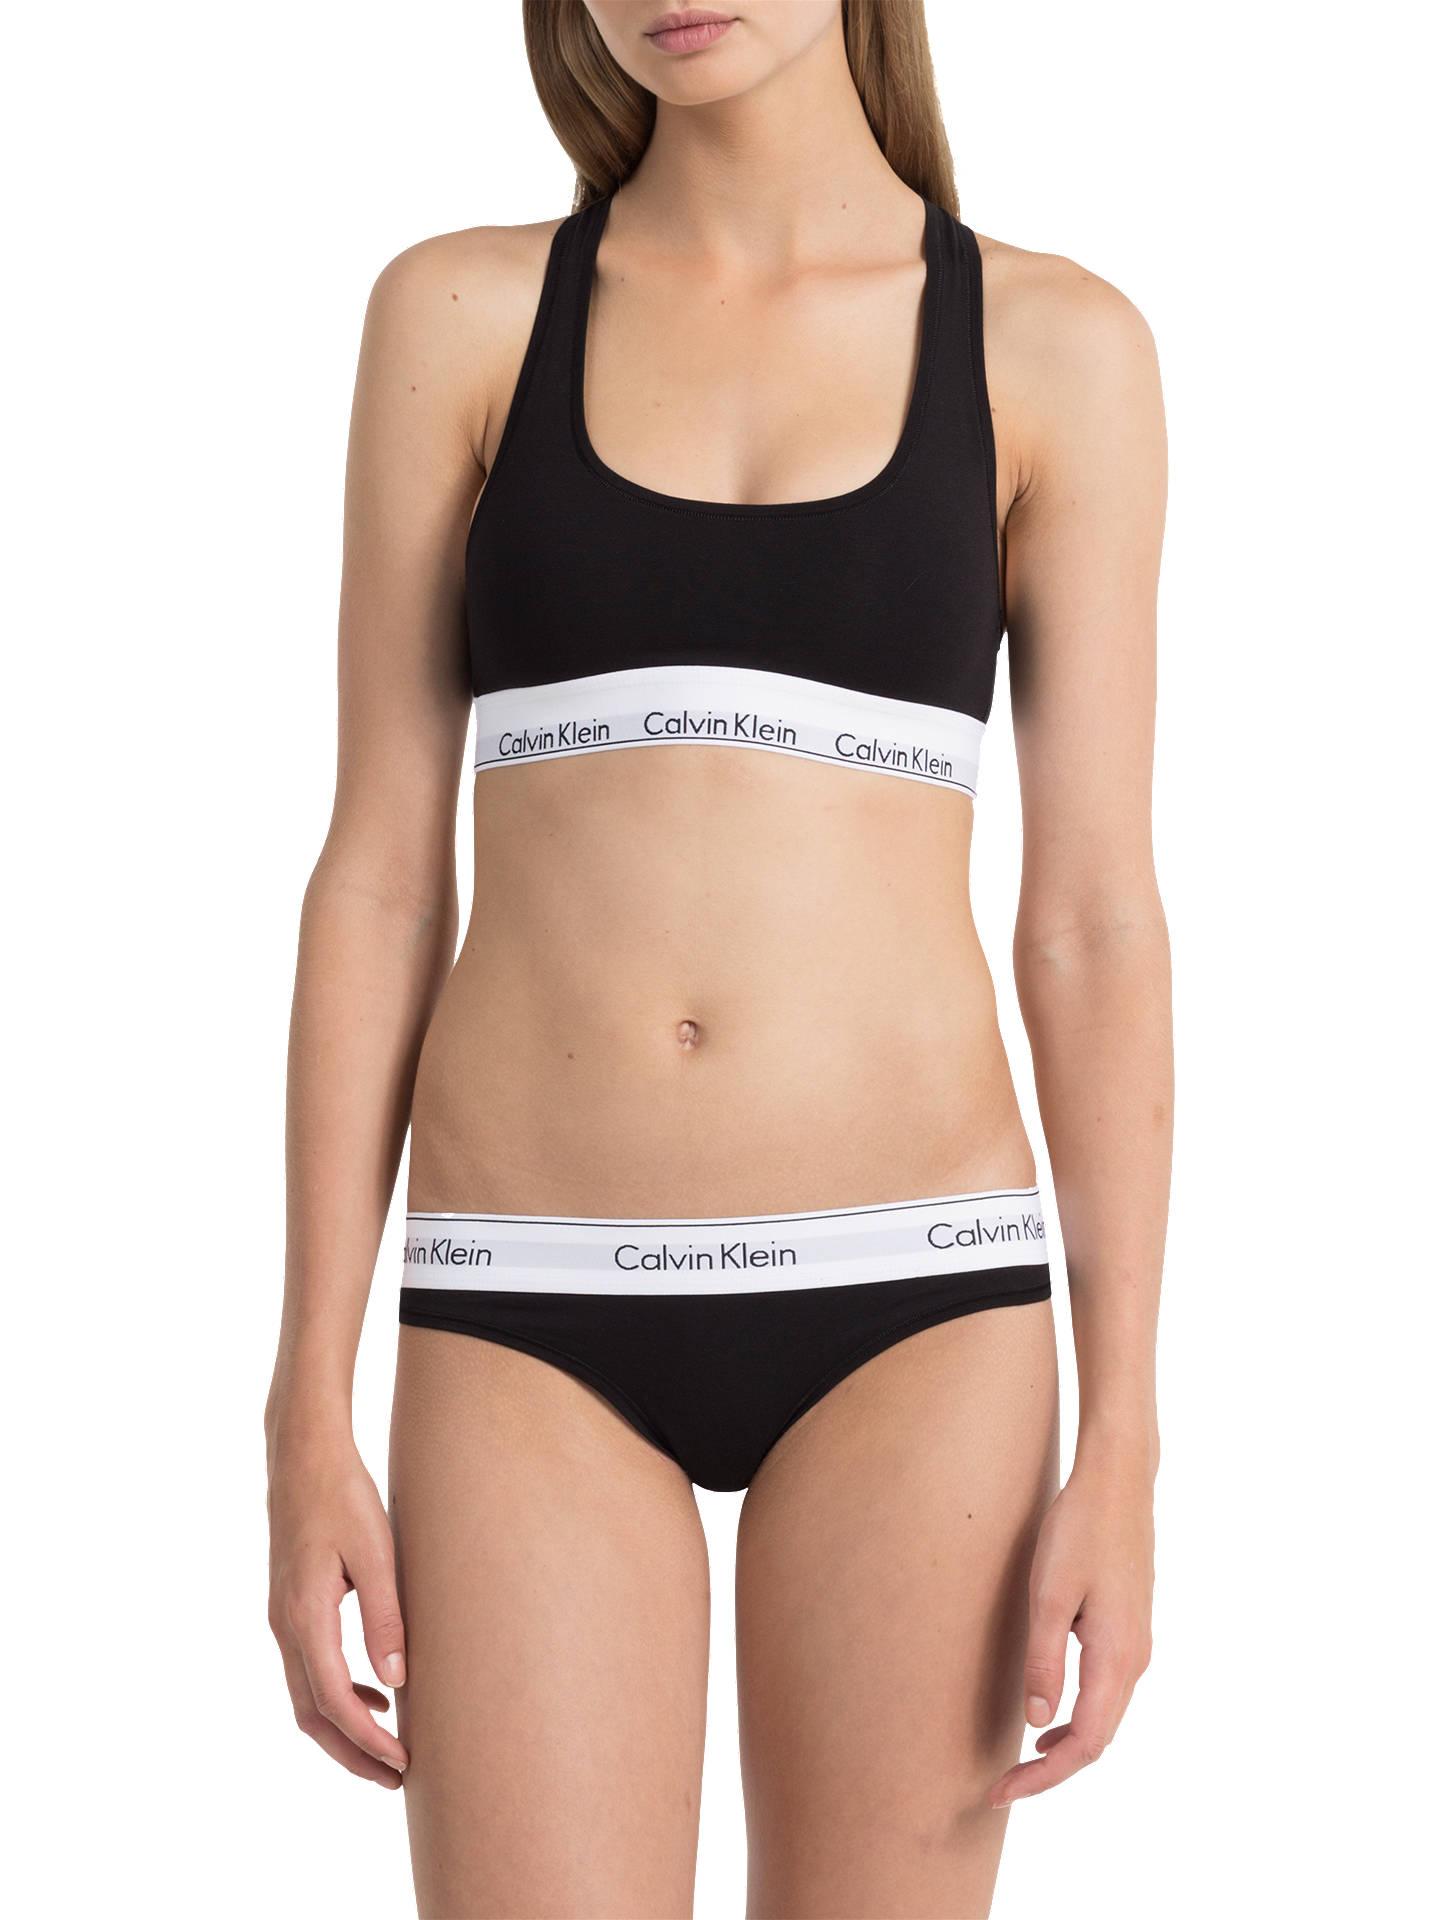 9b65e6aa81 Calvin Klein Underwear Modern Cotton Thong at John Lewis   Partners